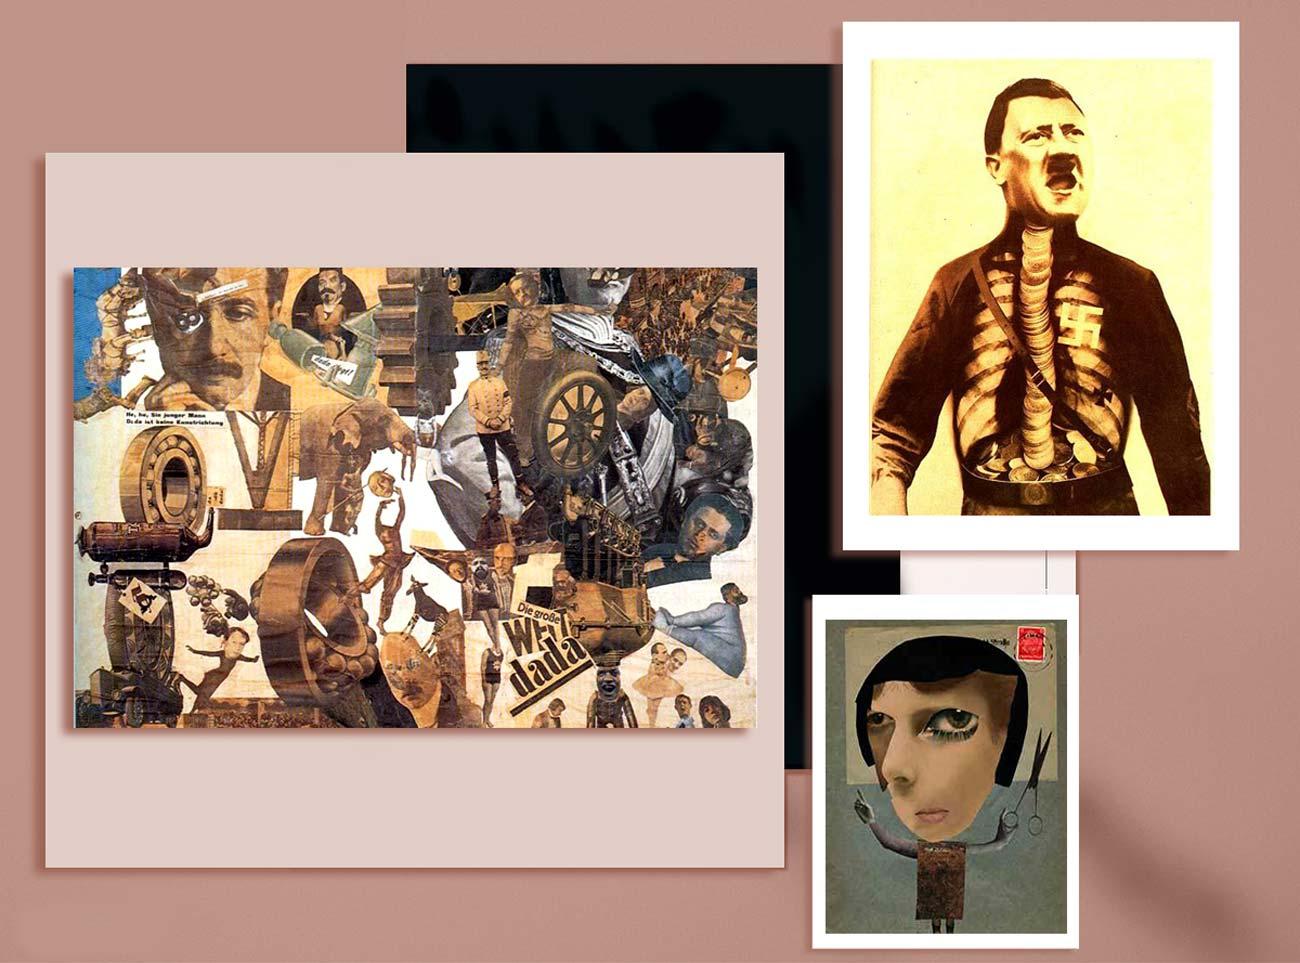 photomontage photoshop history 5 - فتومونتاژ چیست ؟